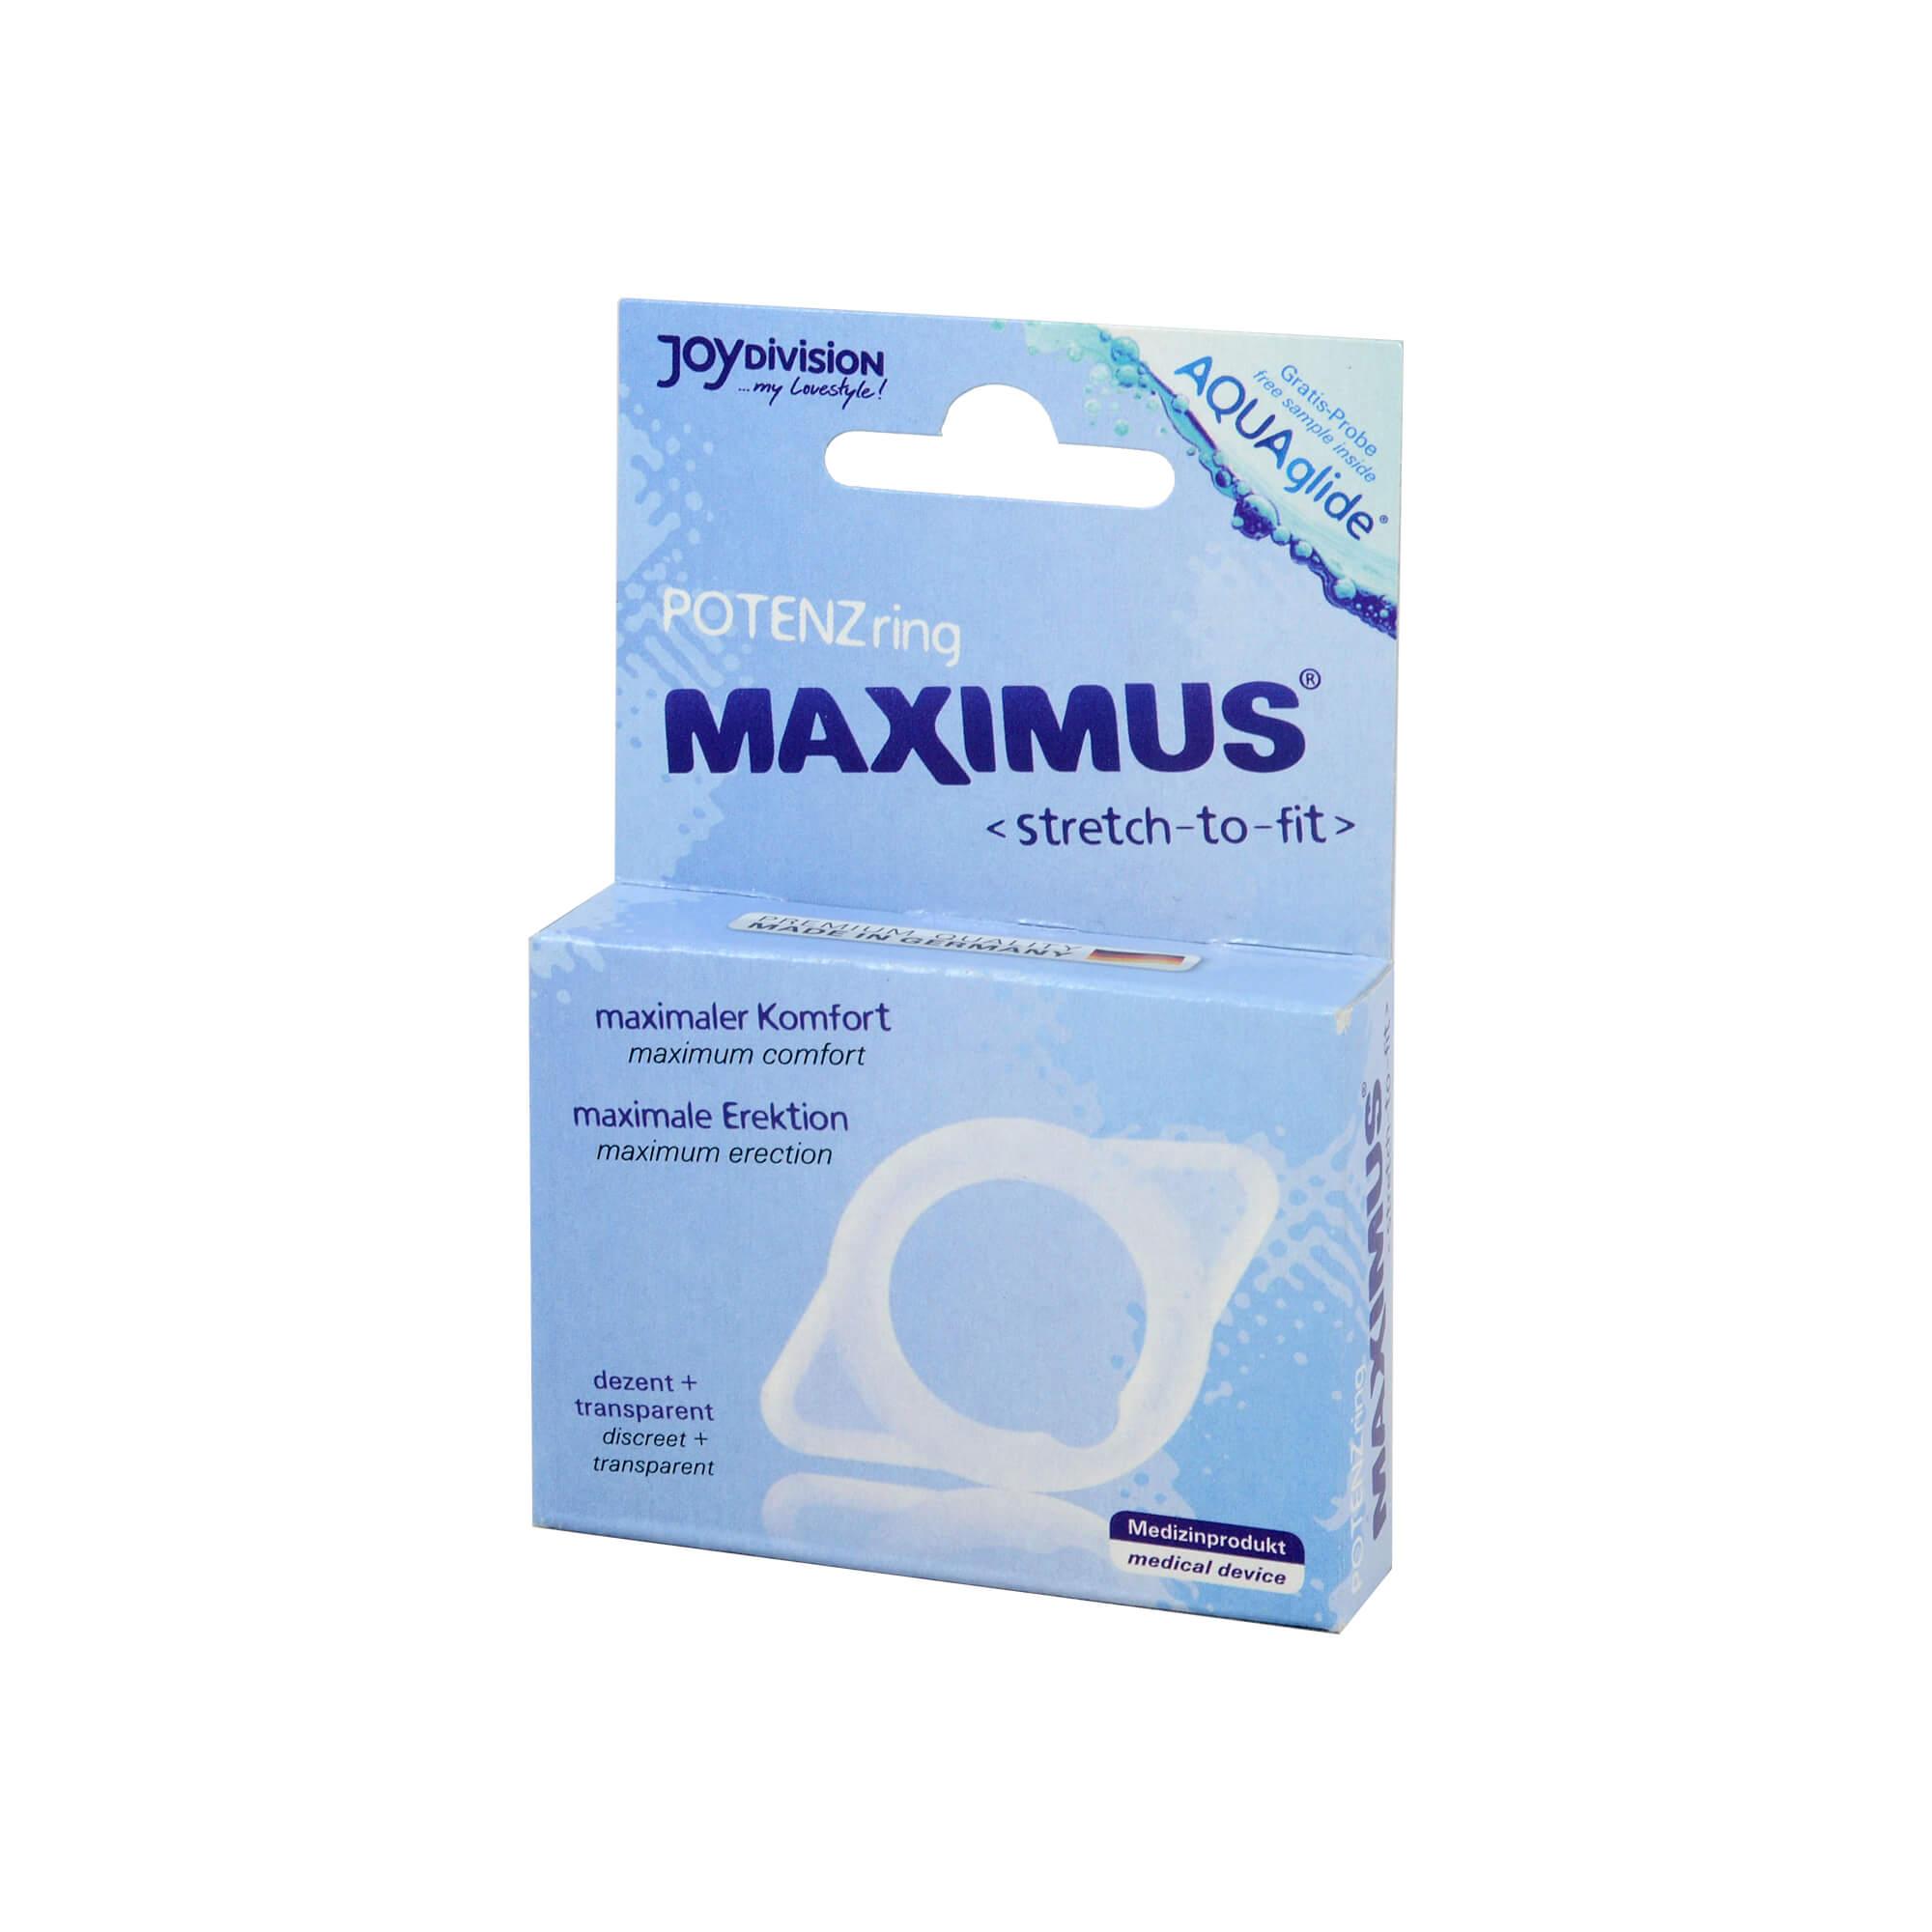 Maximus der Potenzring S